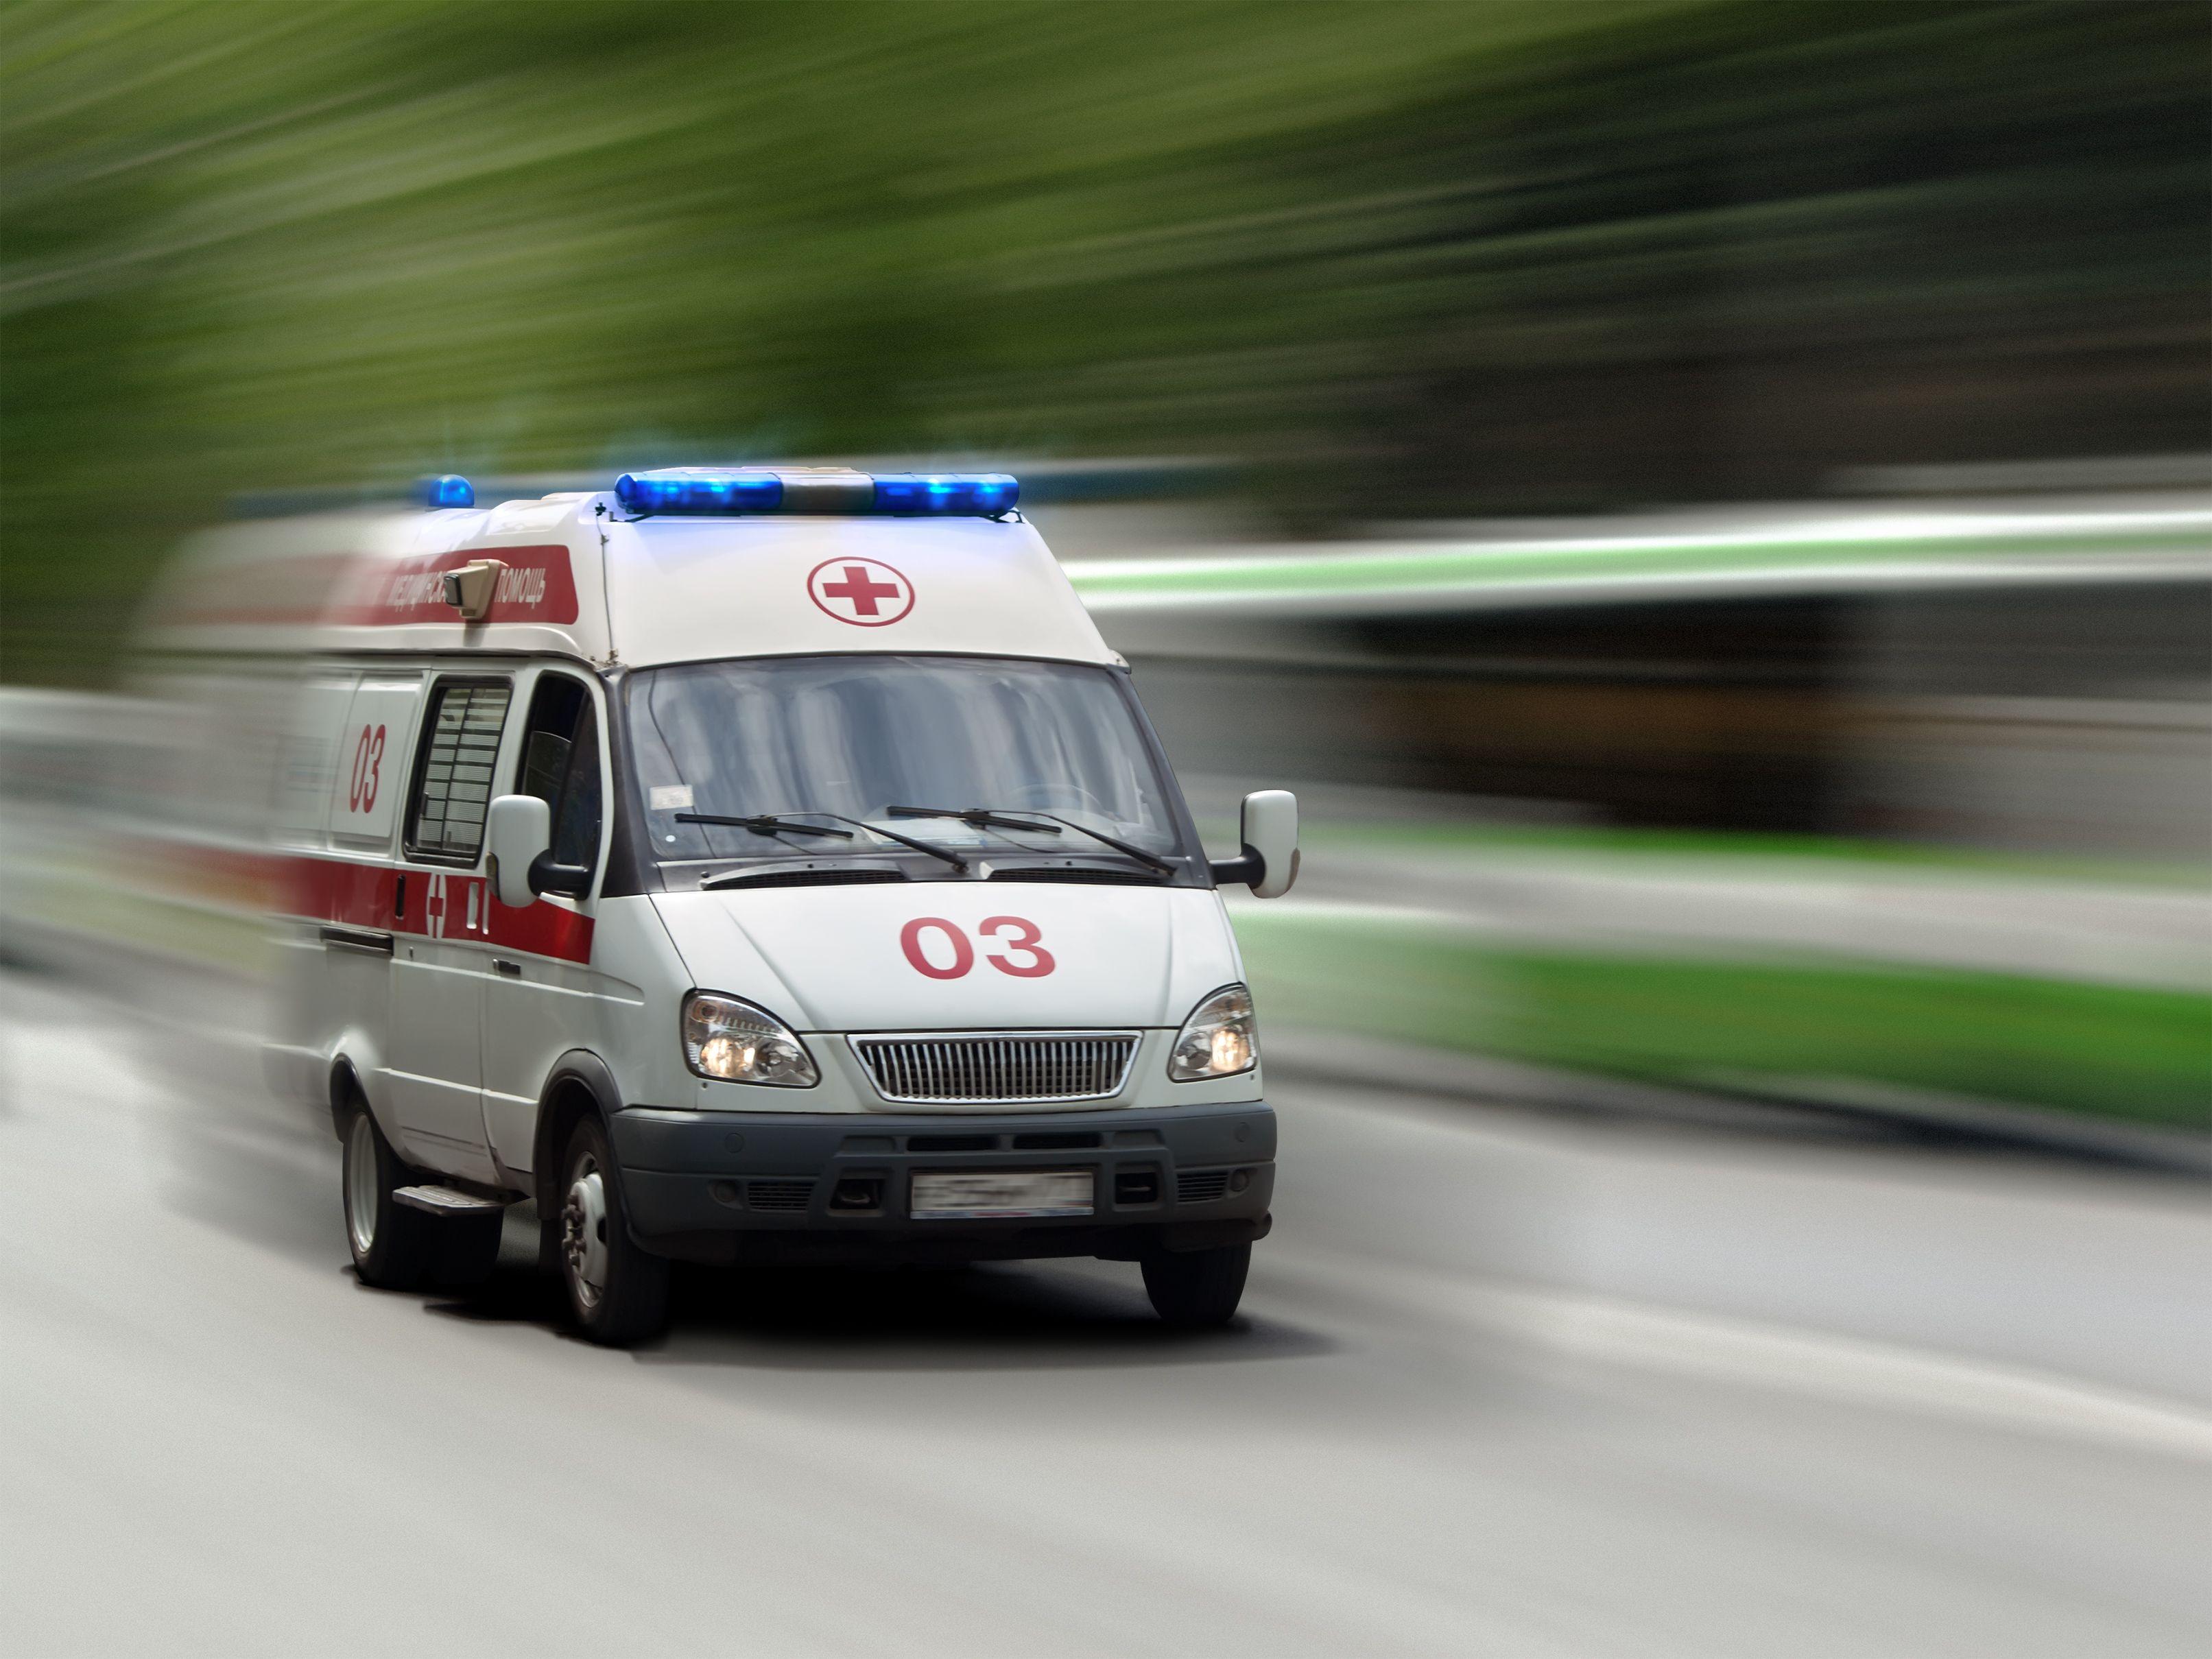 В Бахчисарайском районе мужчина погиб под колесами своего же автомобиля